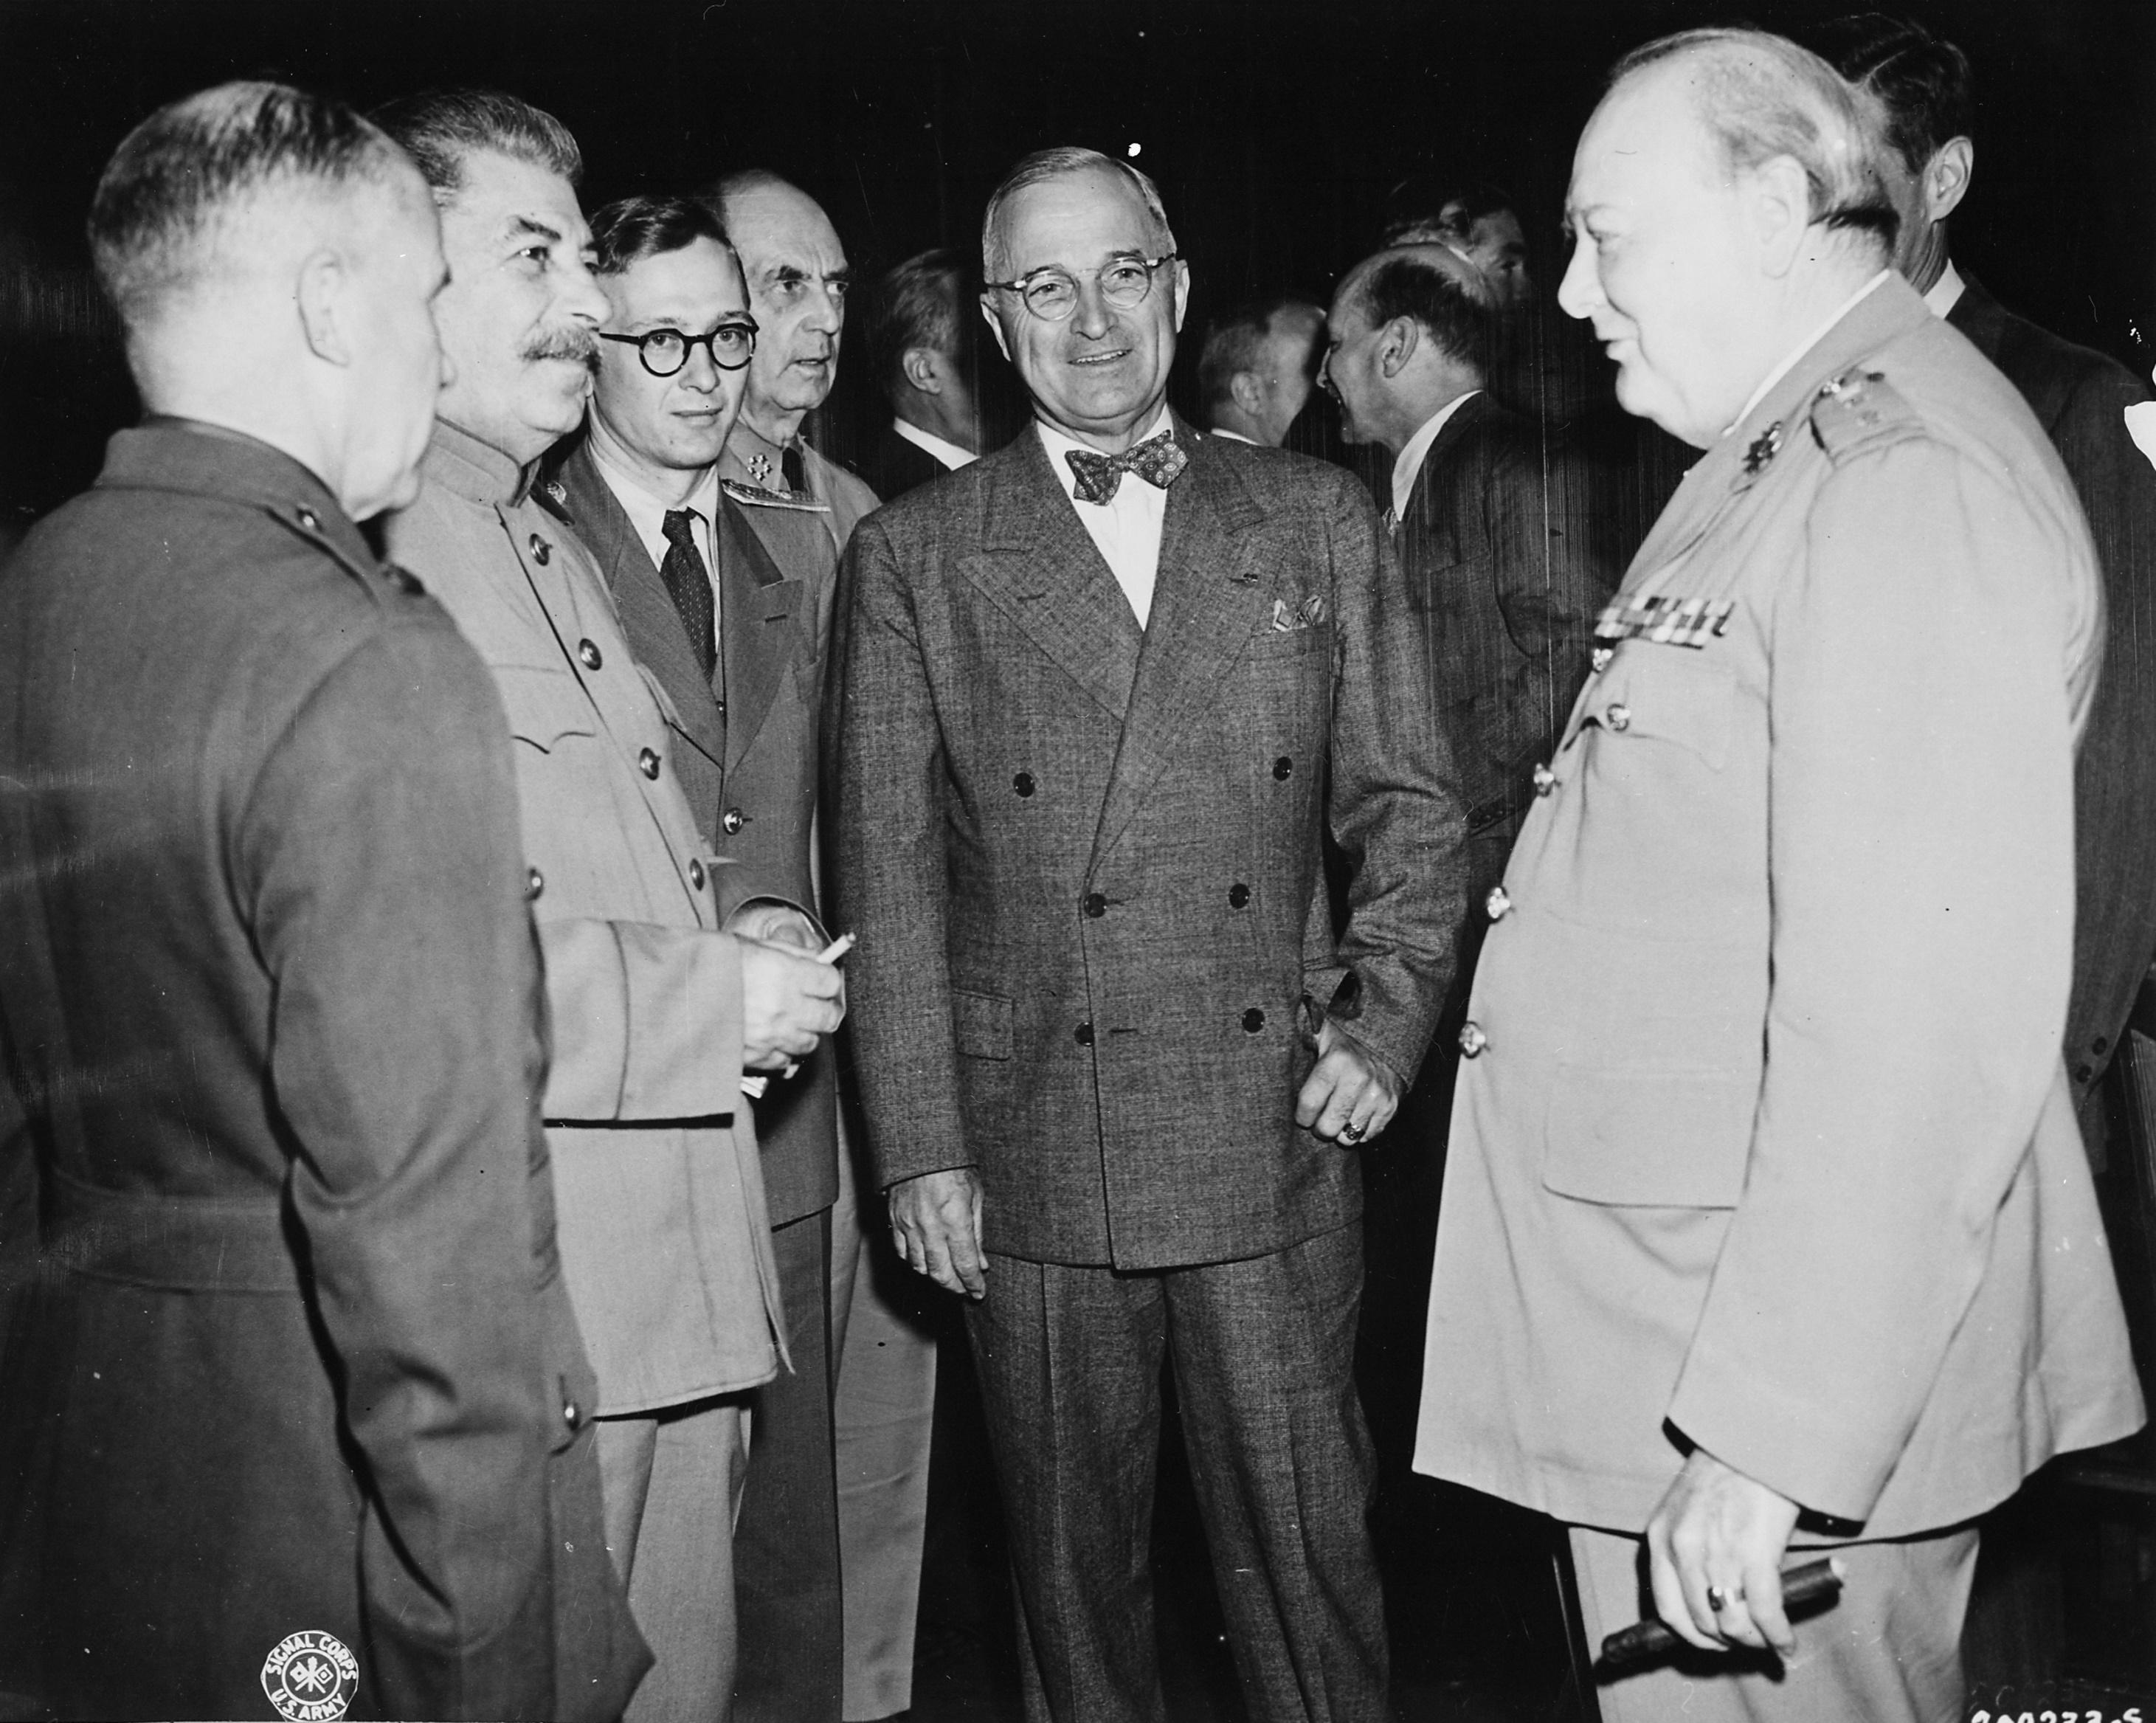 UN DIA COMO HOY EN LA HISTORIA - Página 9 Bundesarchiv_Bild_183-29645-0001%2C_Potsdamer_Konferenz%2C_Stalin%2C_Truman%2C_Churchill